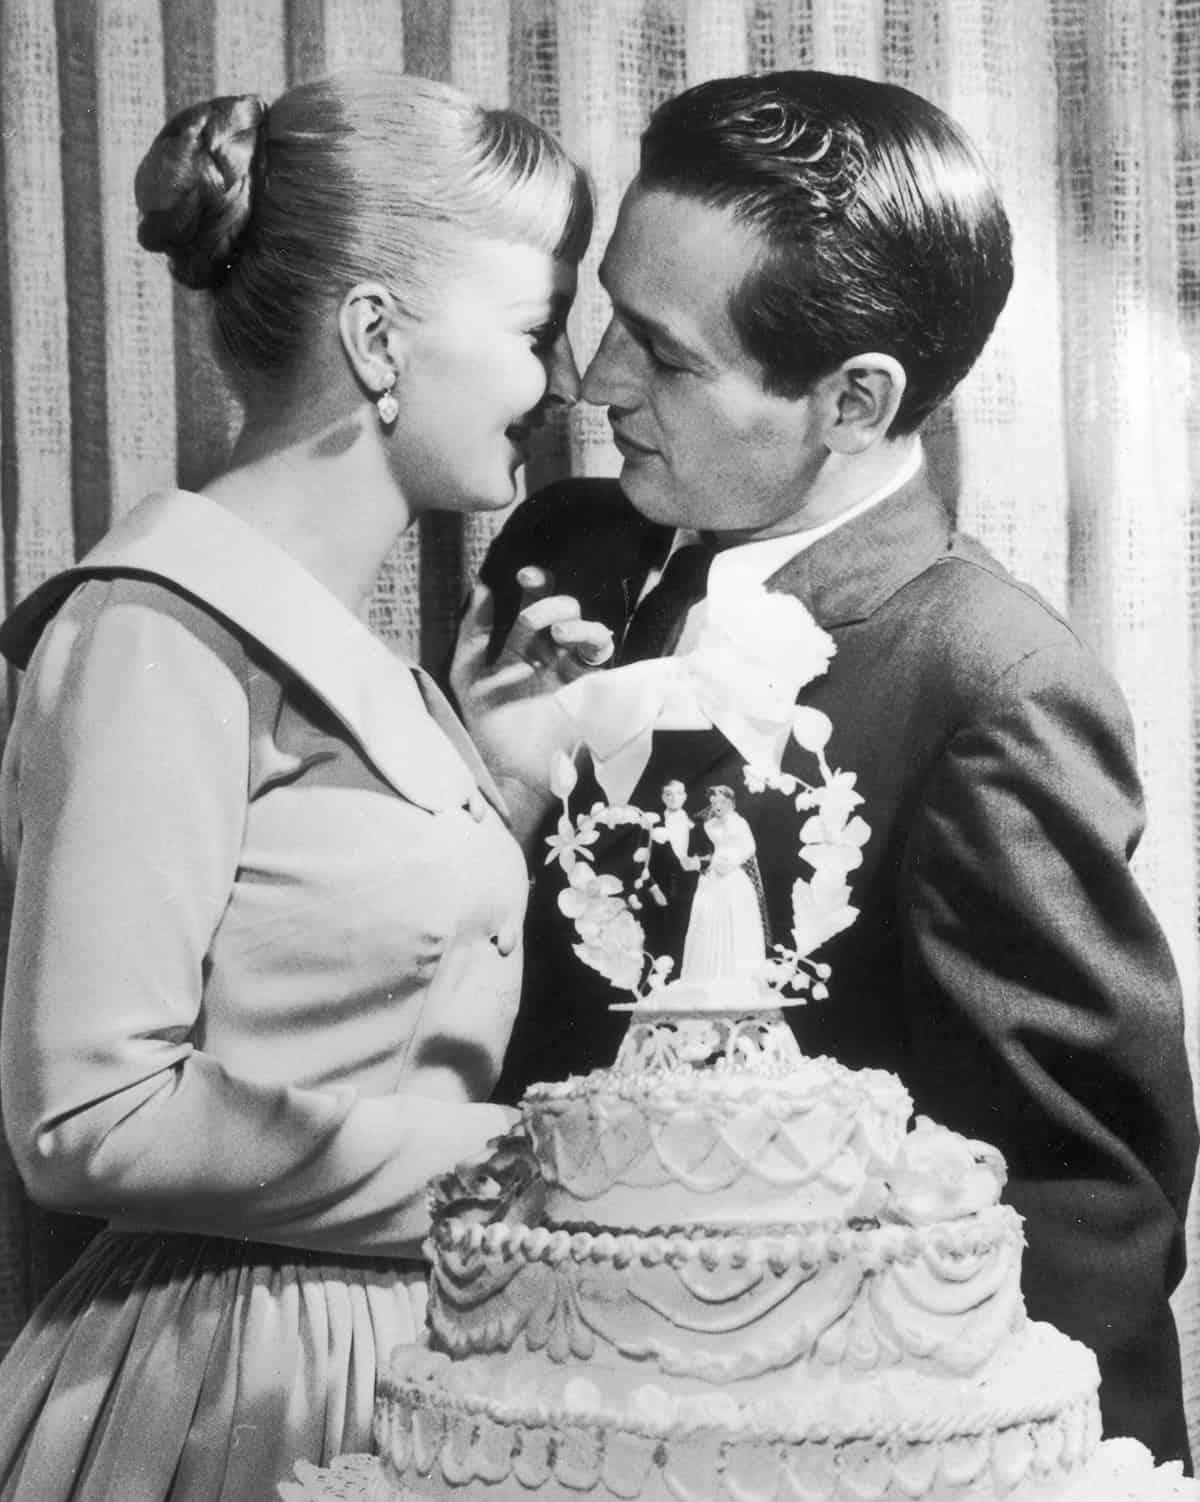 Joanne Woodward and Paul Newman, 1958